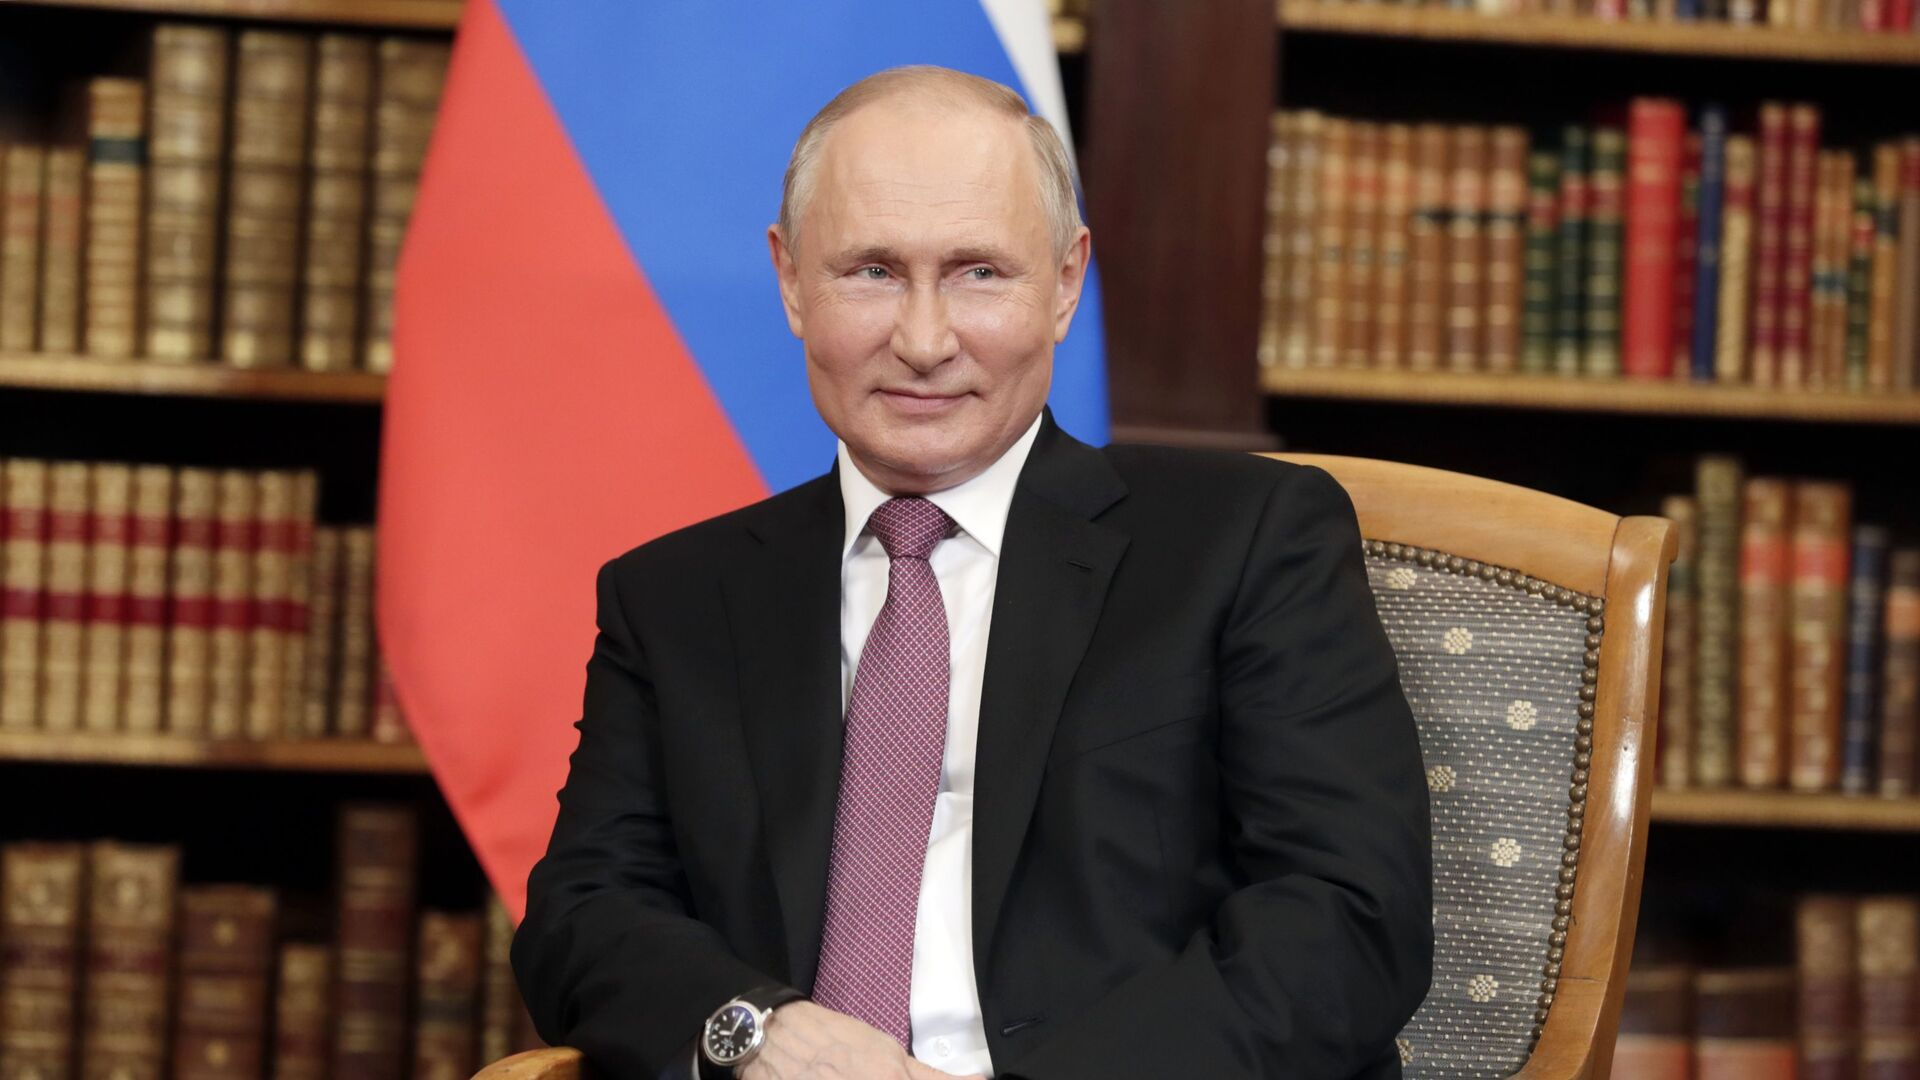 Władimir Putin - Sputnik Polska, 1920, 17.06.2021